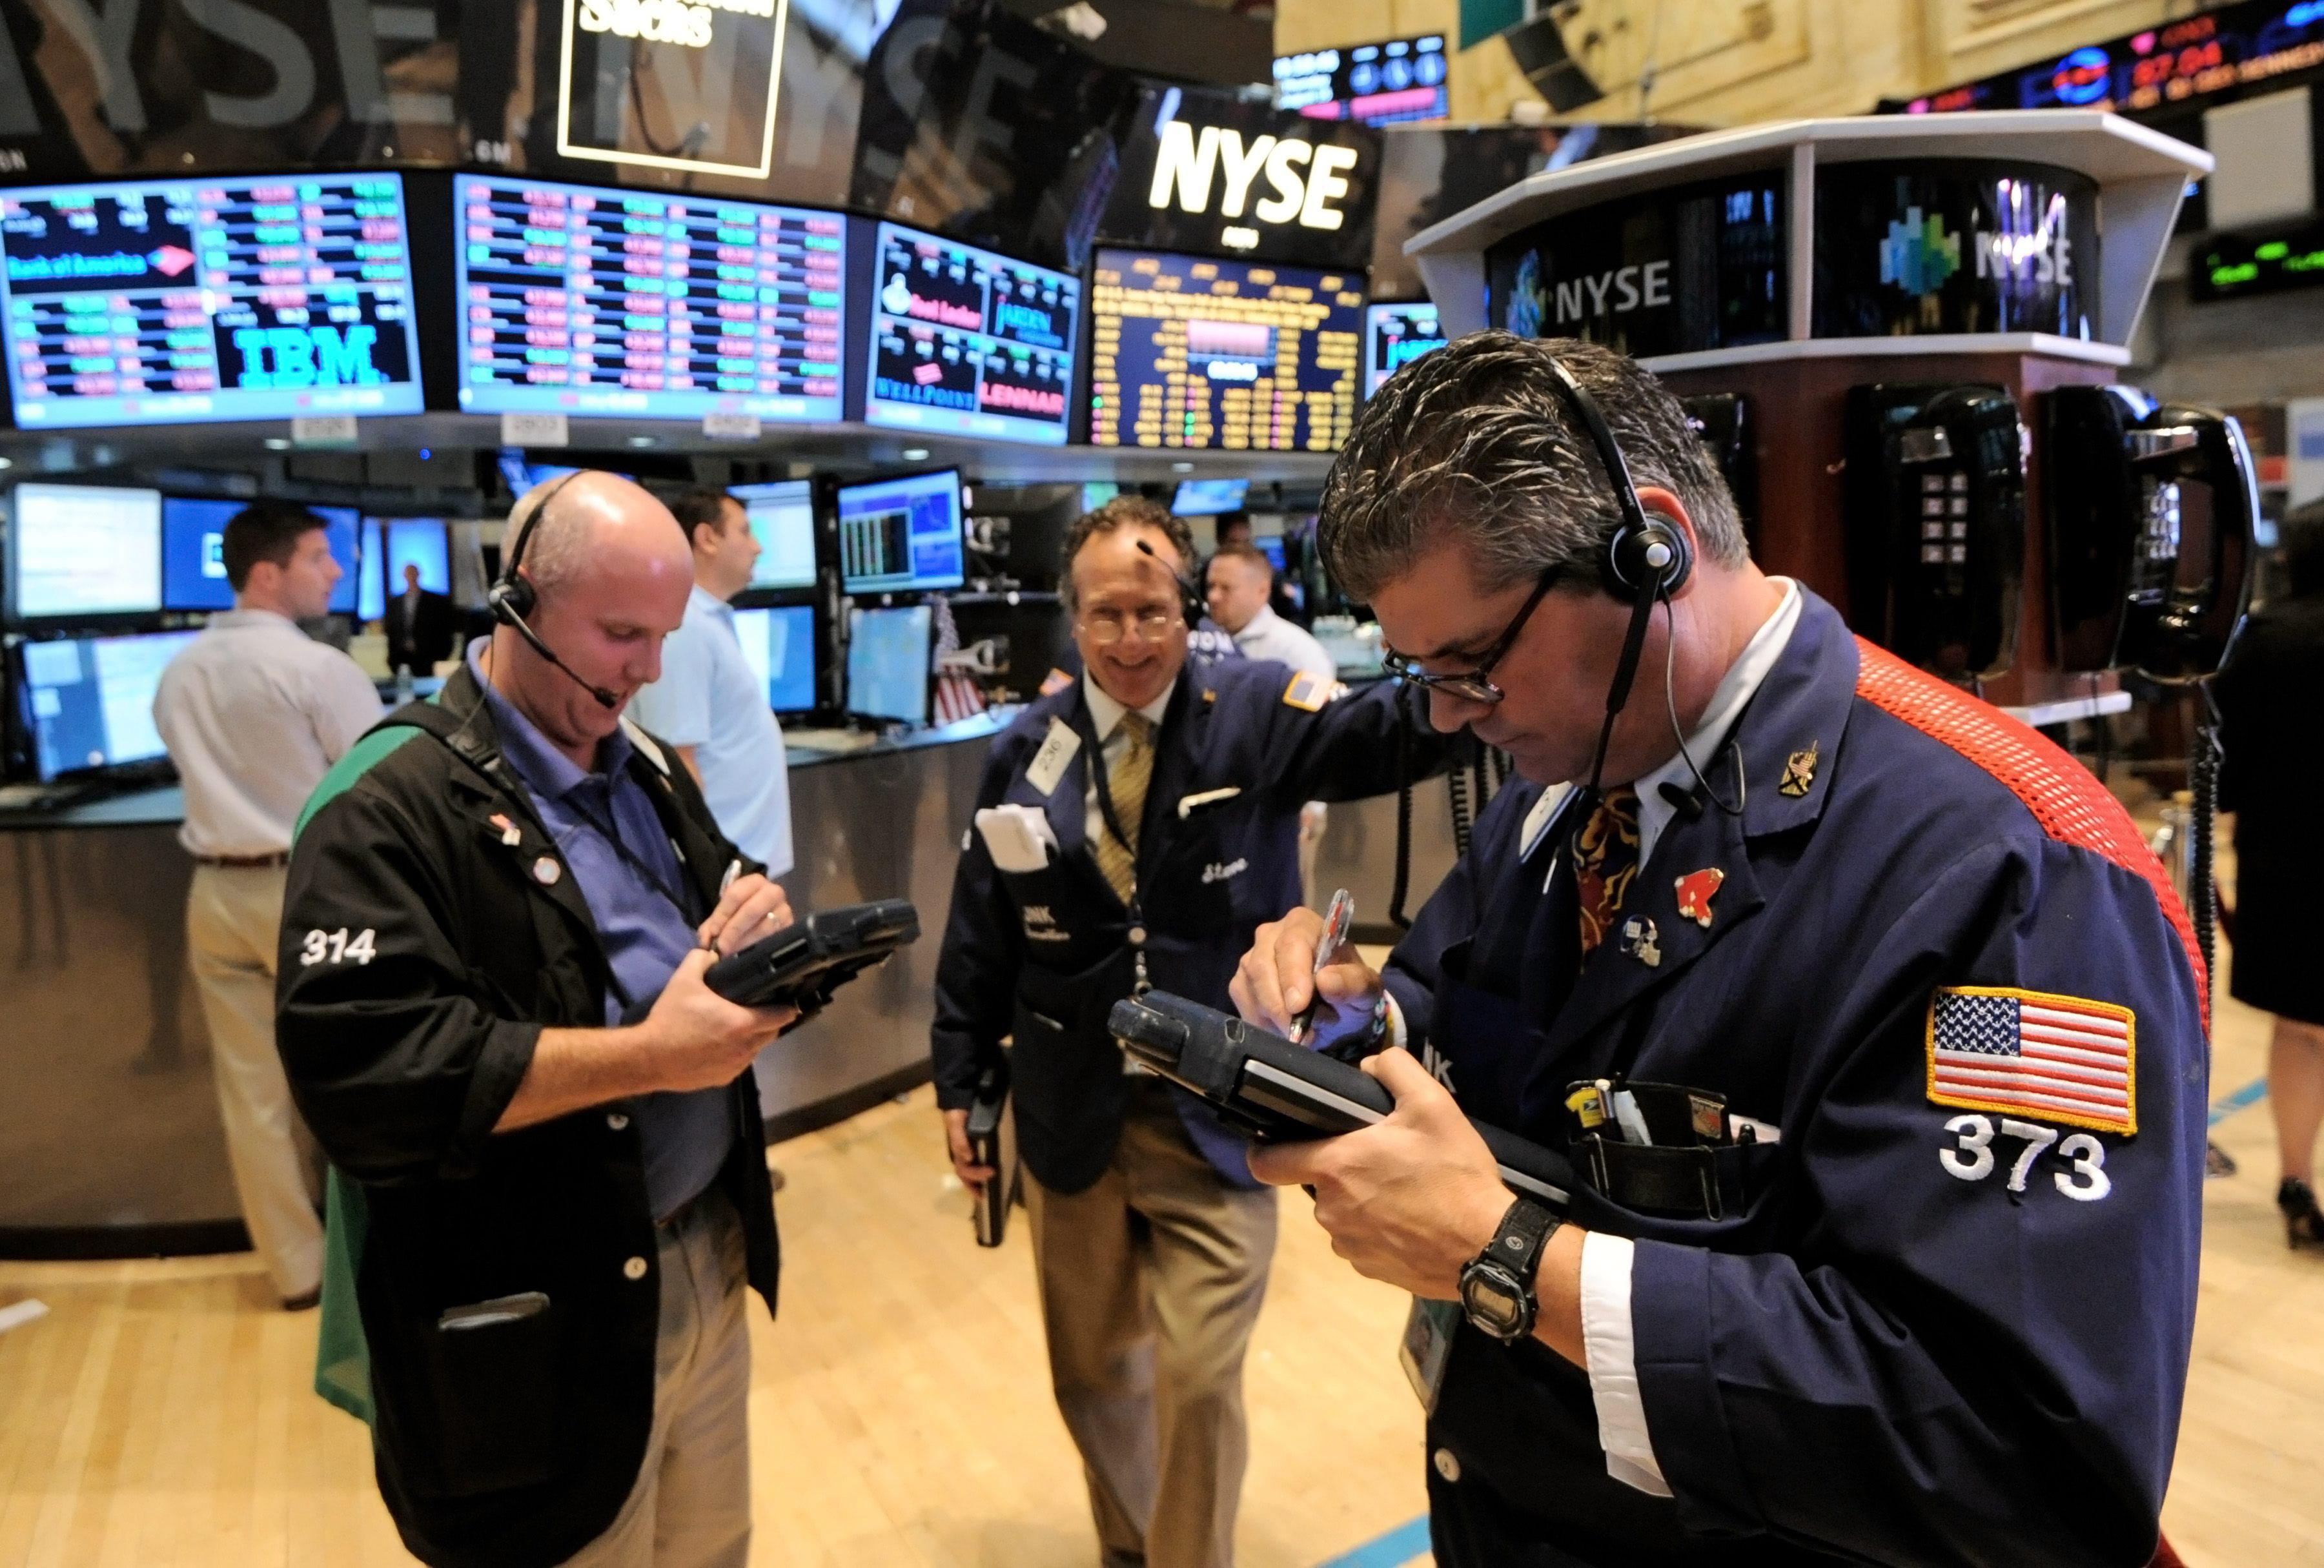 Wall Street sube un 0,10 por ciento a pesar de la tensión sobre Siria